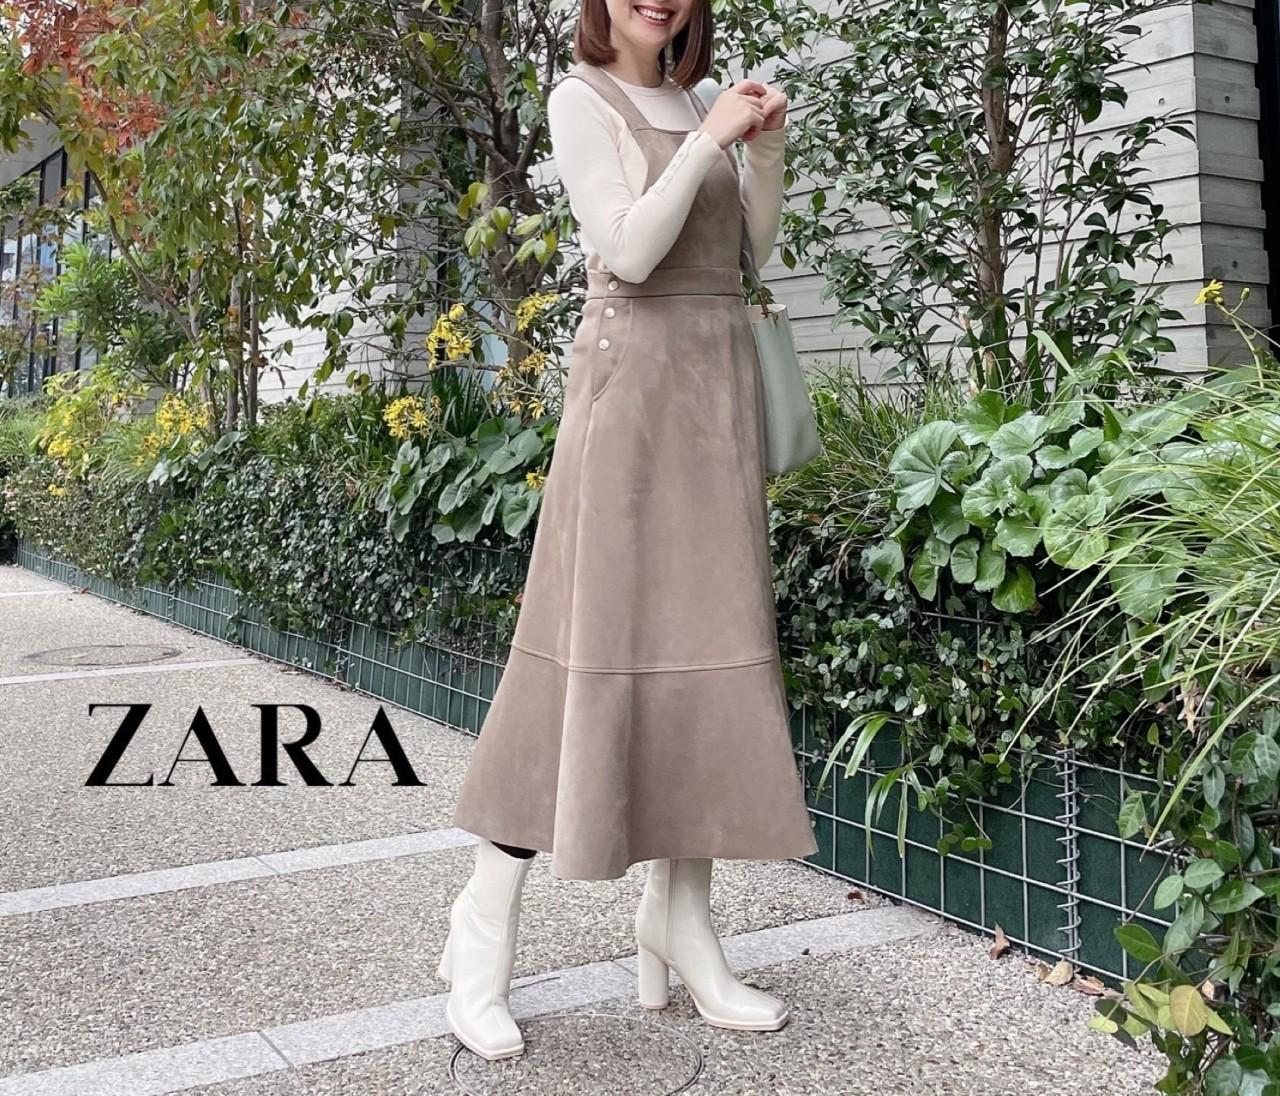 【ZARA購入品】上下ザラで作るホワイト×グレージュコーデ